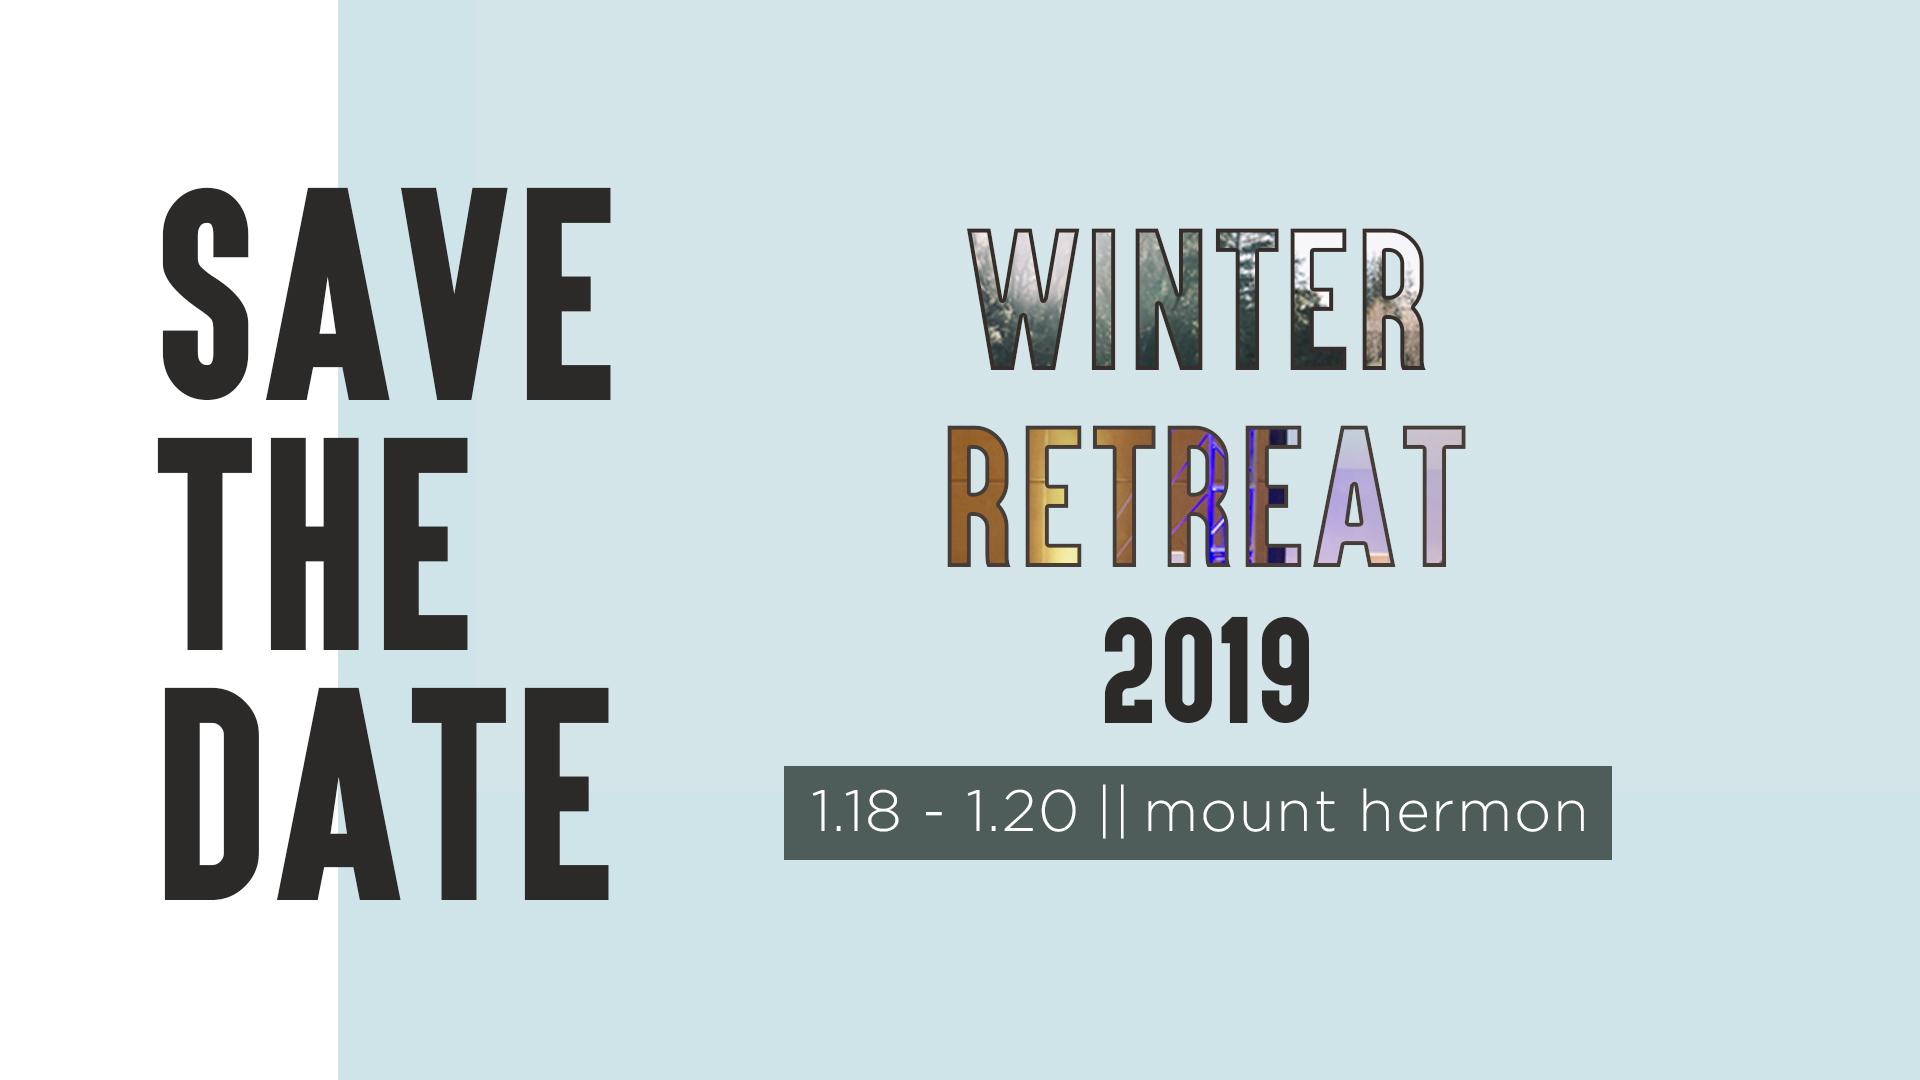 WinterRetreat_all_2019_splash.jpg